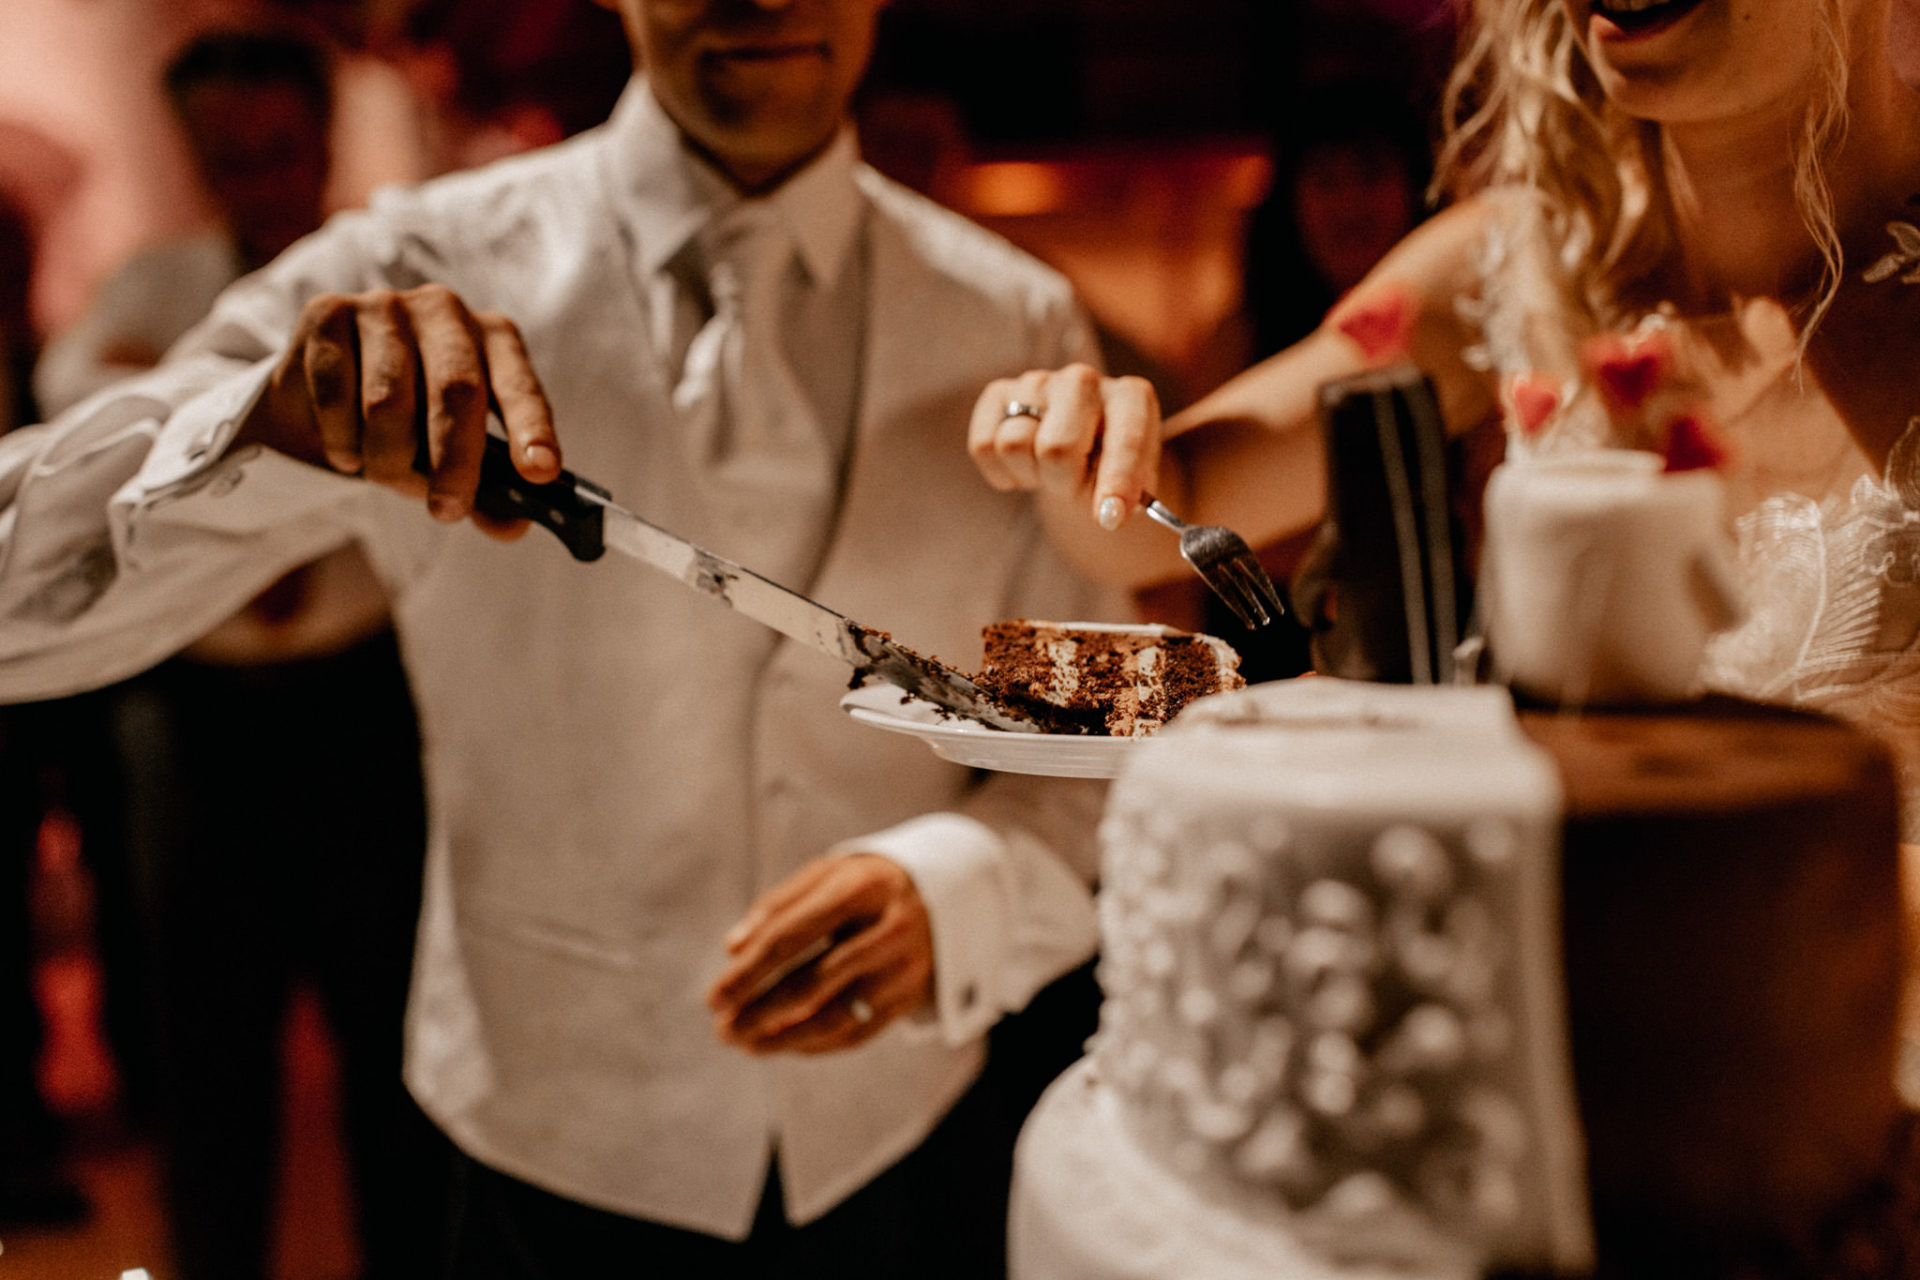 wedding photographer suttgart-reception water castle Erkenbrechtshausen Crailsheim-party-cake cutting